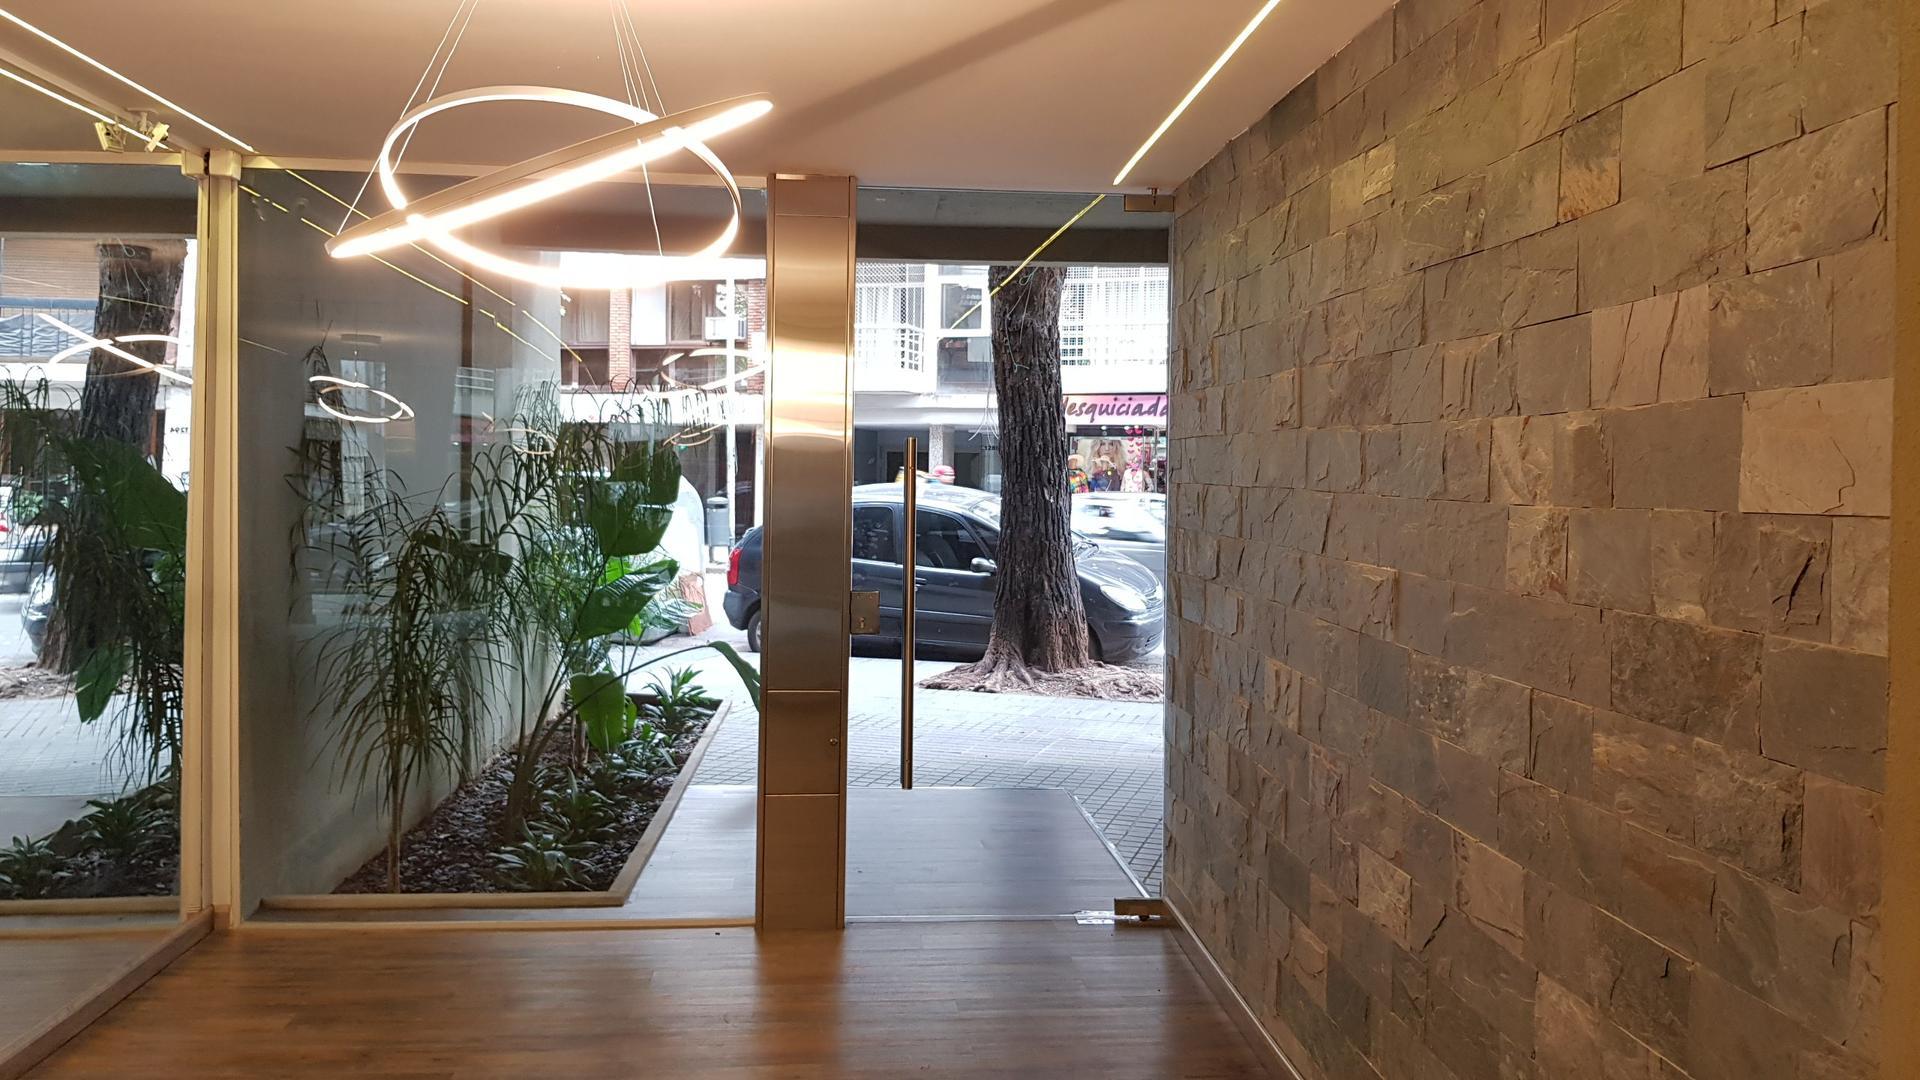 Departamento - 37 m² | Monoambiente | Apto profesional